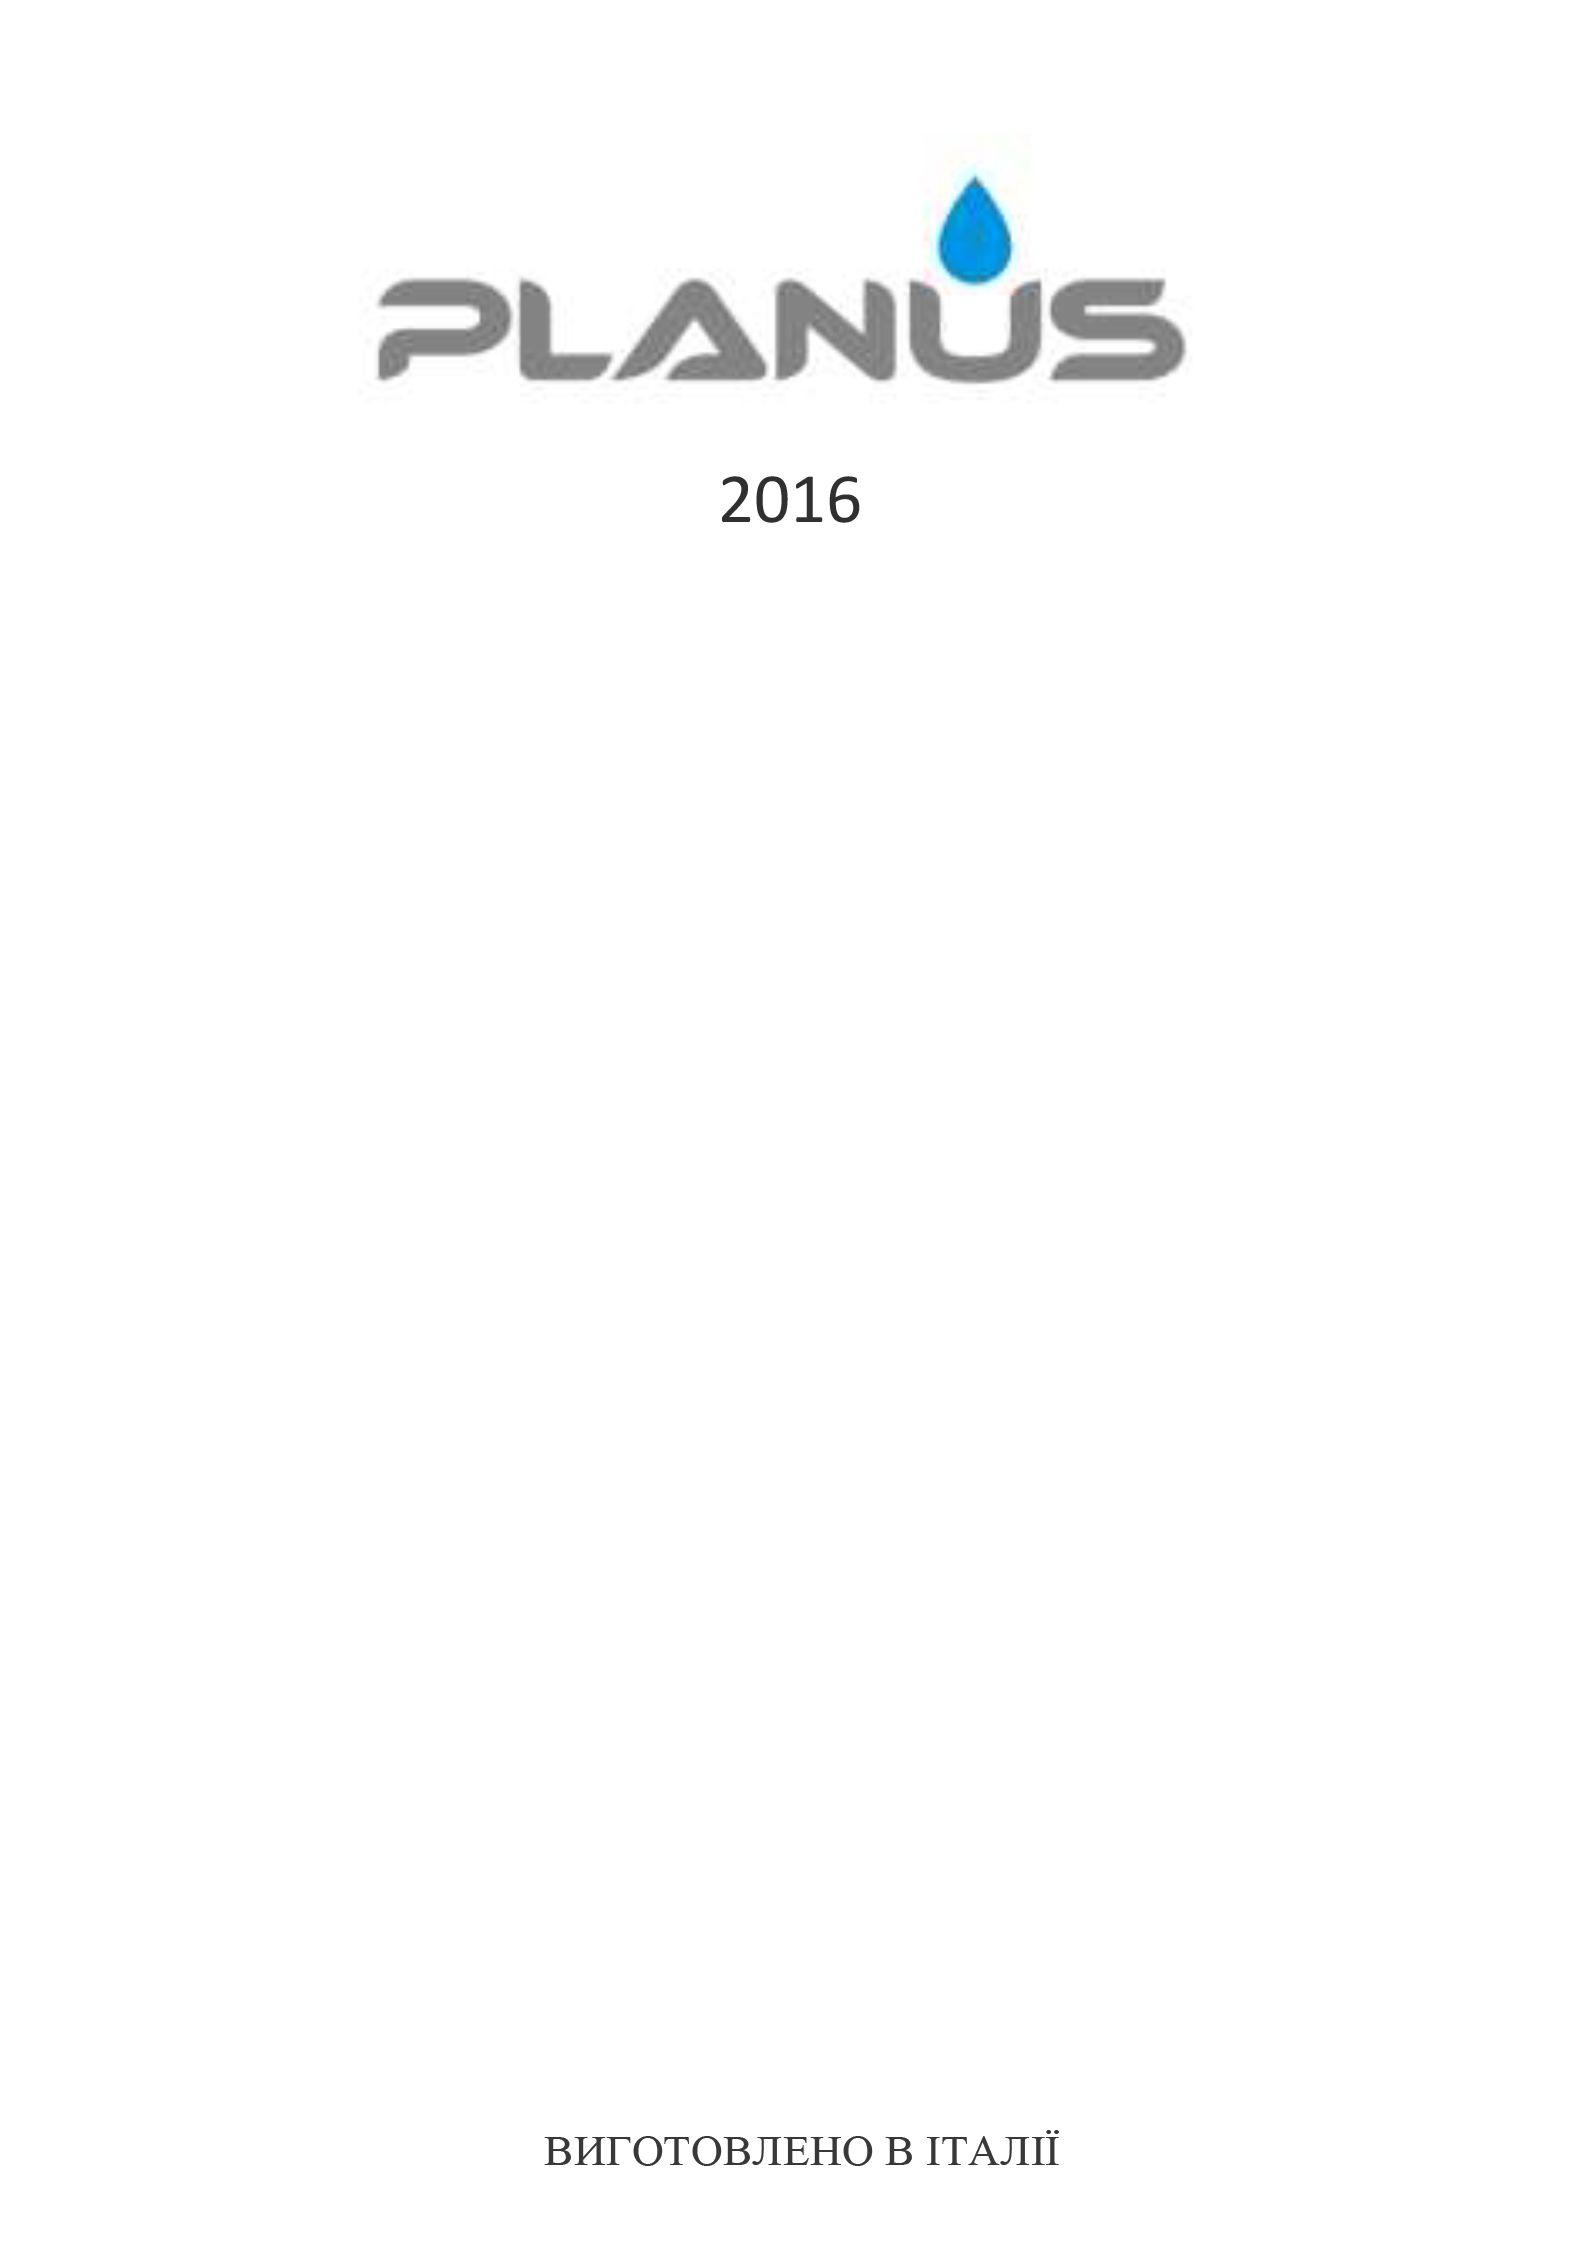 страничка каталога Planus 2016